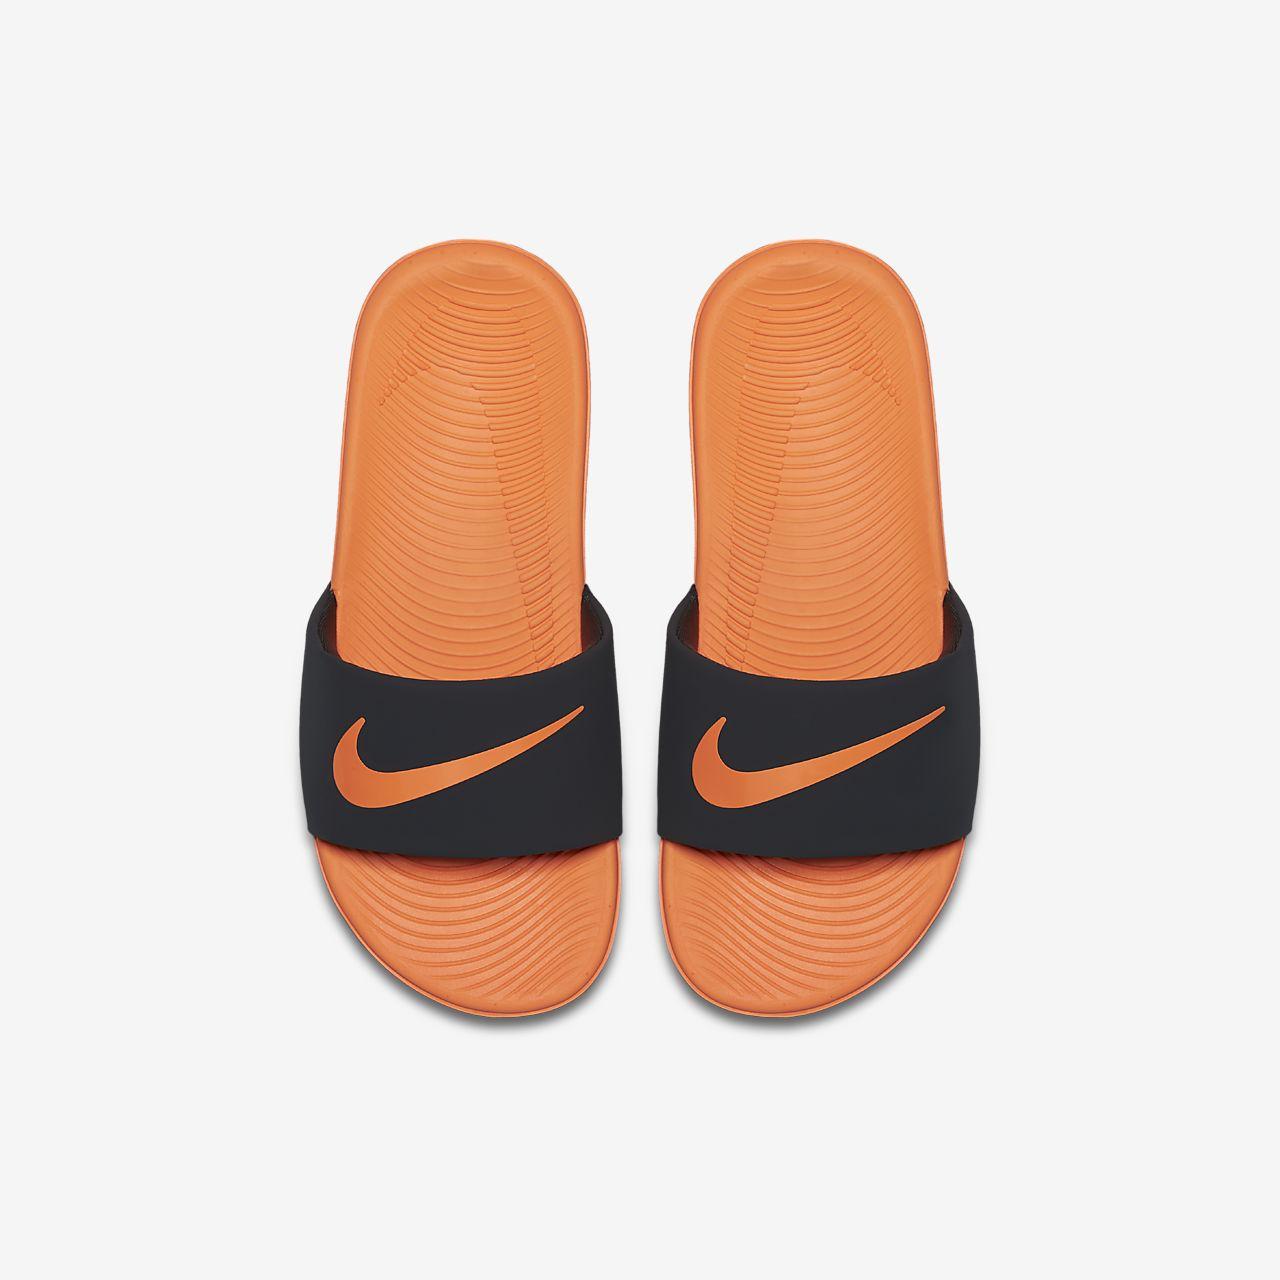 nike sandals for girls. sandals \u0026 flip flops nike for girls